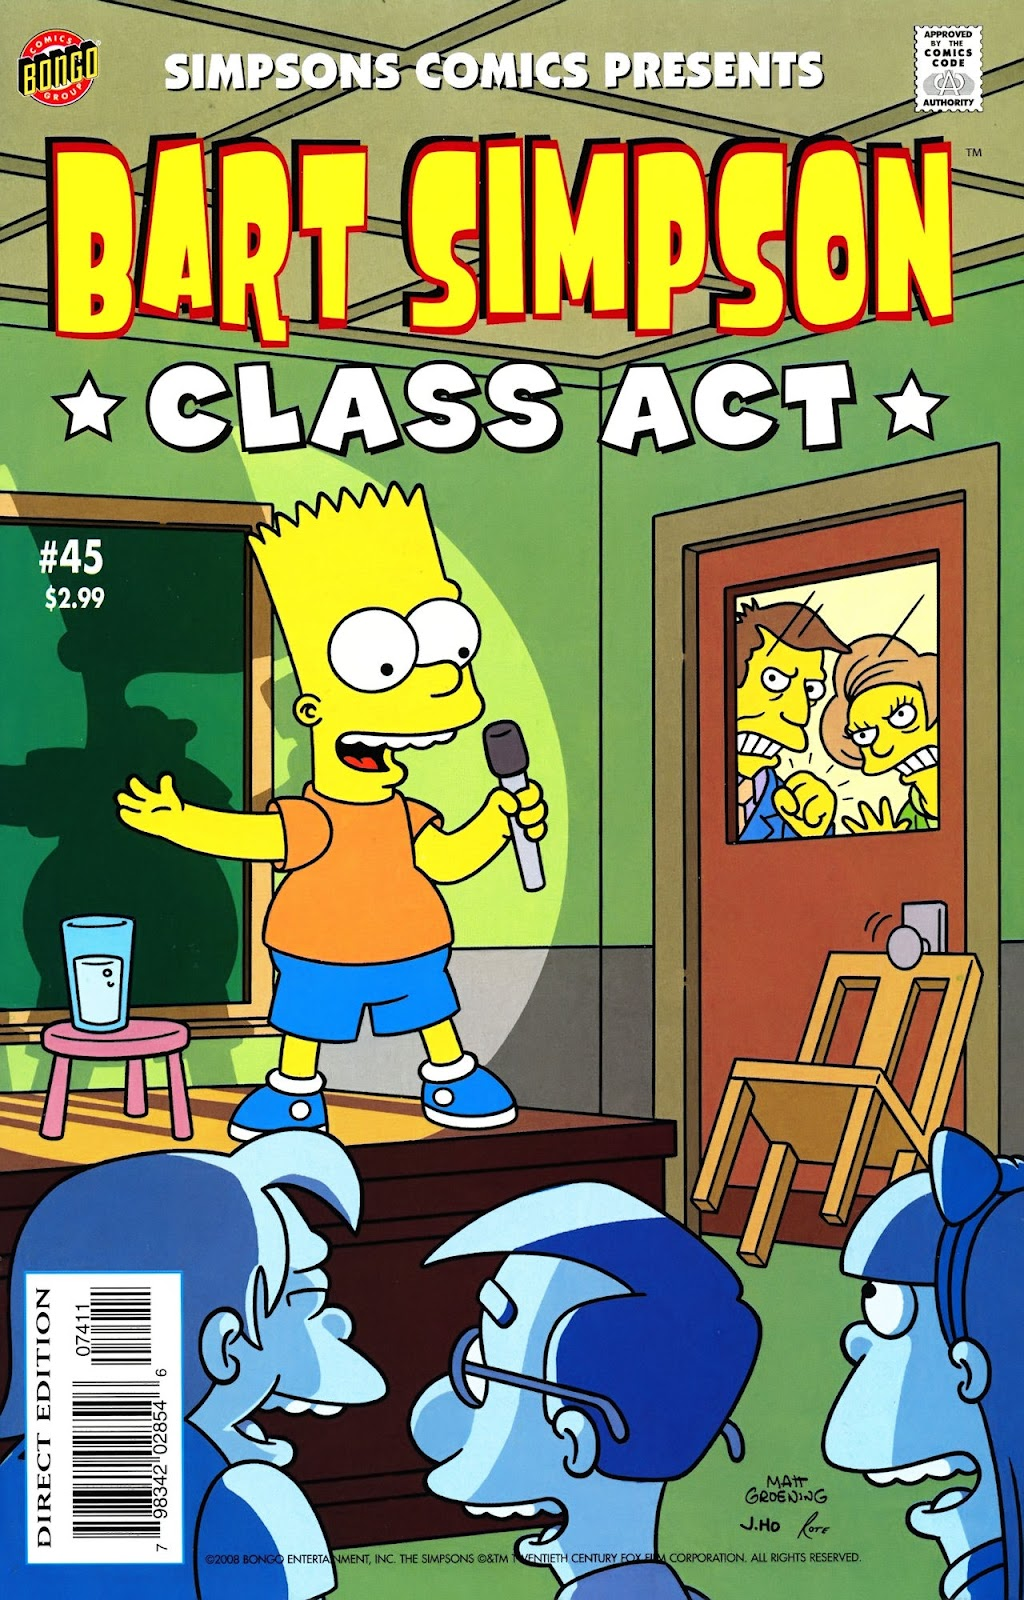 Simpsons Comics Presents Bart Simpson 45 Page 1